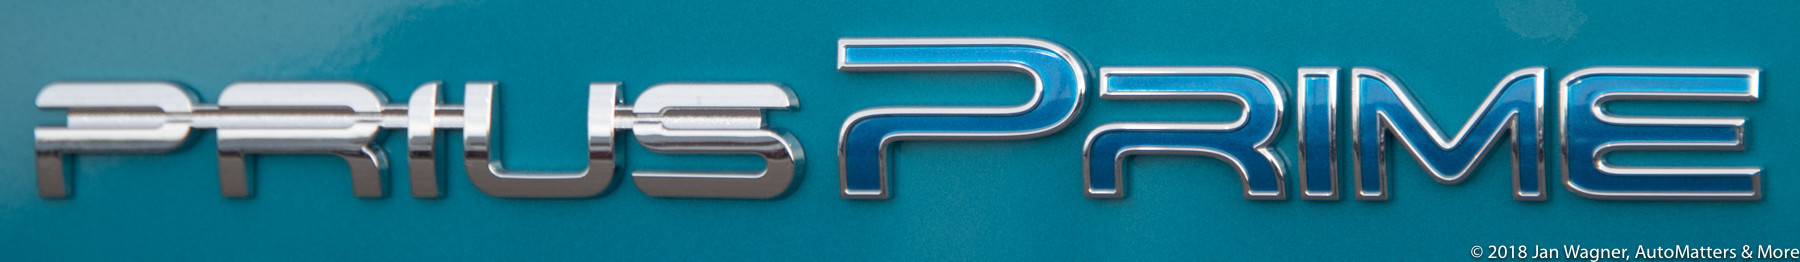 01640-20180406 2018 Toyota Prius Prime at Kearny Mesa Toyota & 2018 Volvo XC40-D5